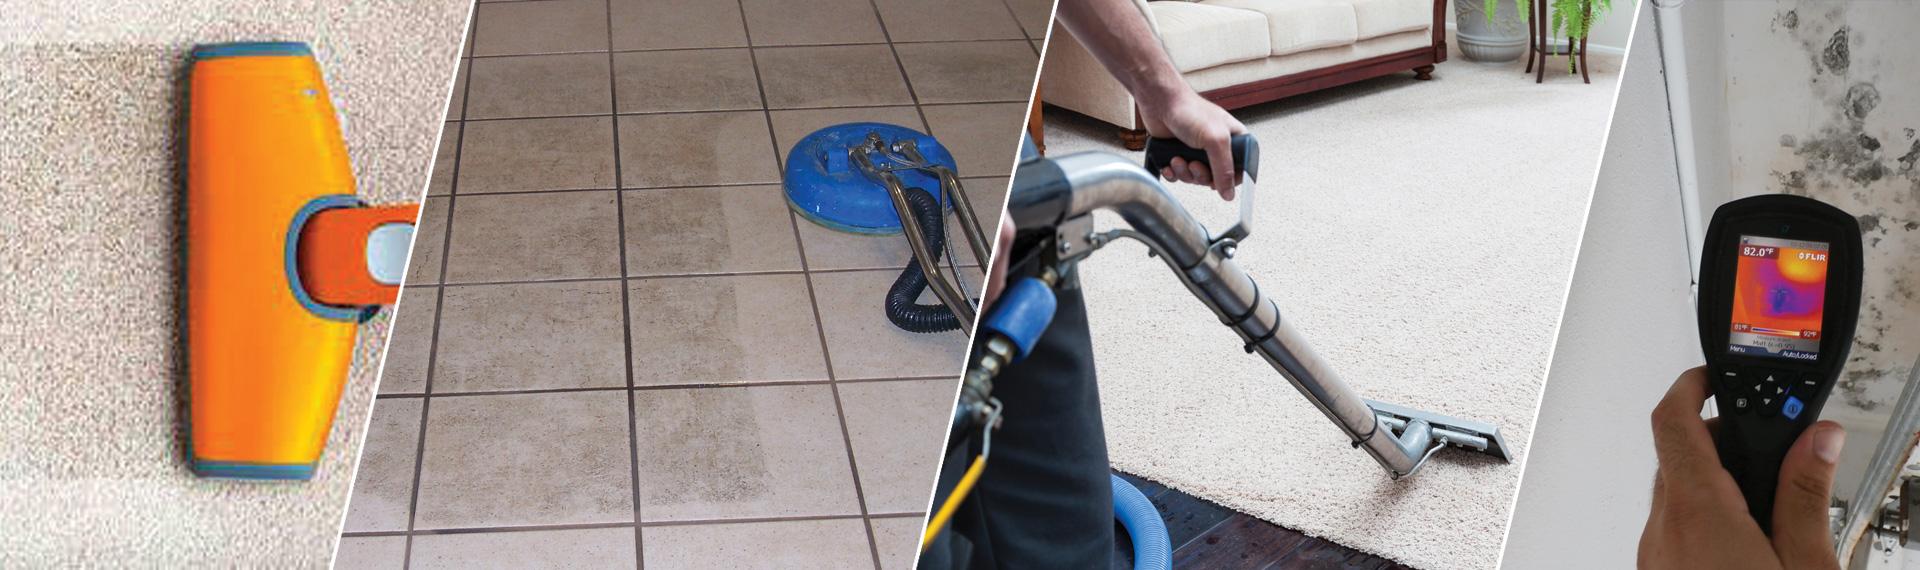 City Carpet Cleaners & Water Damage Restoration League City TX